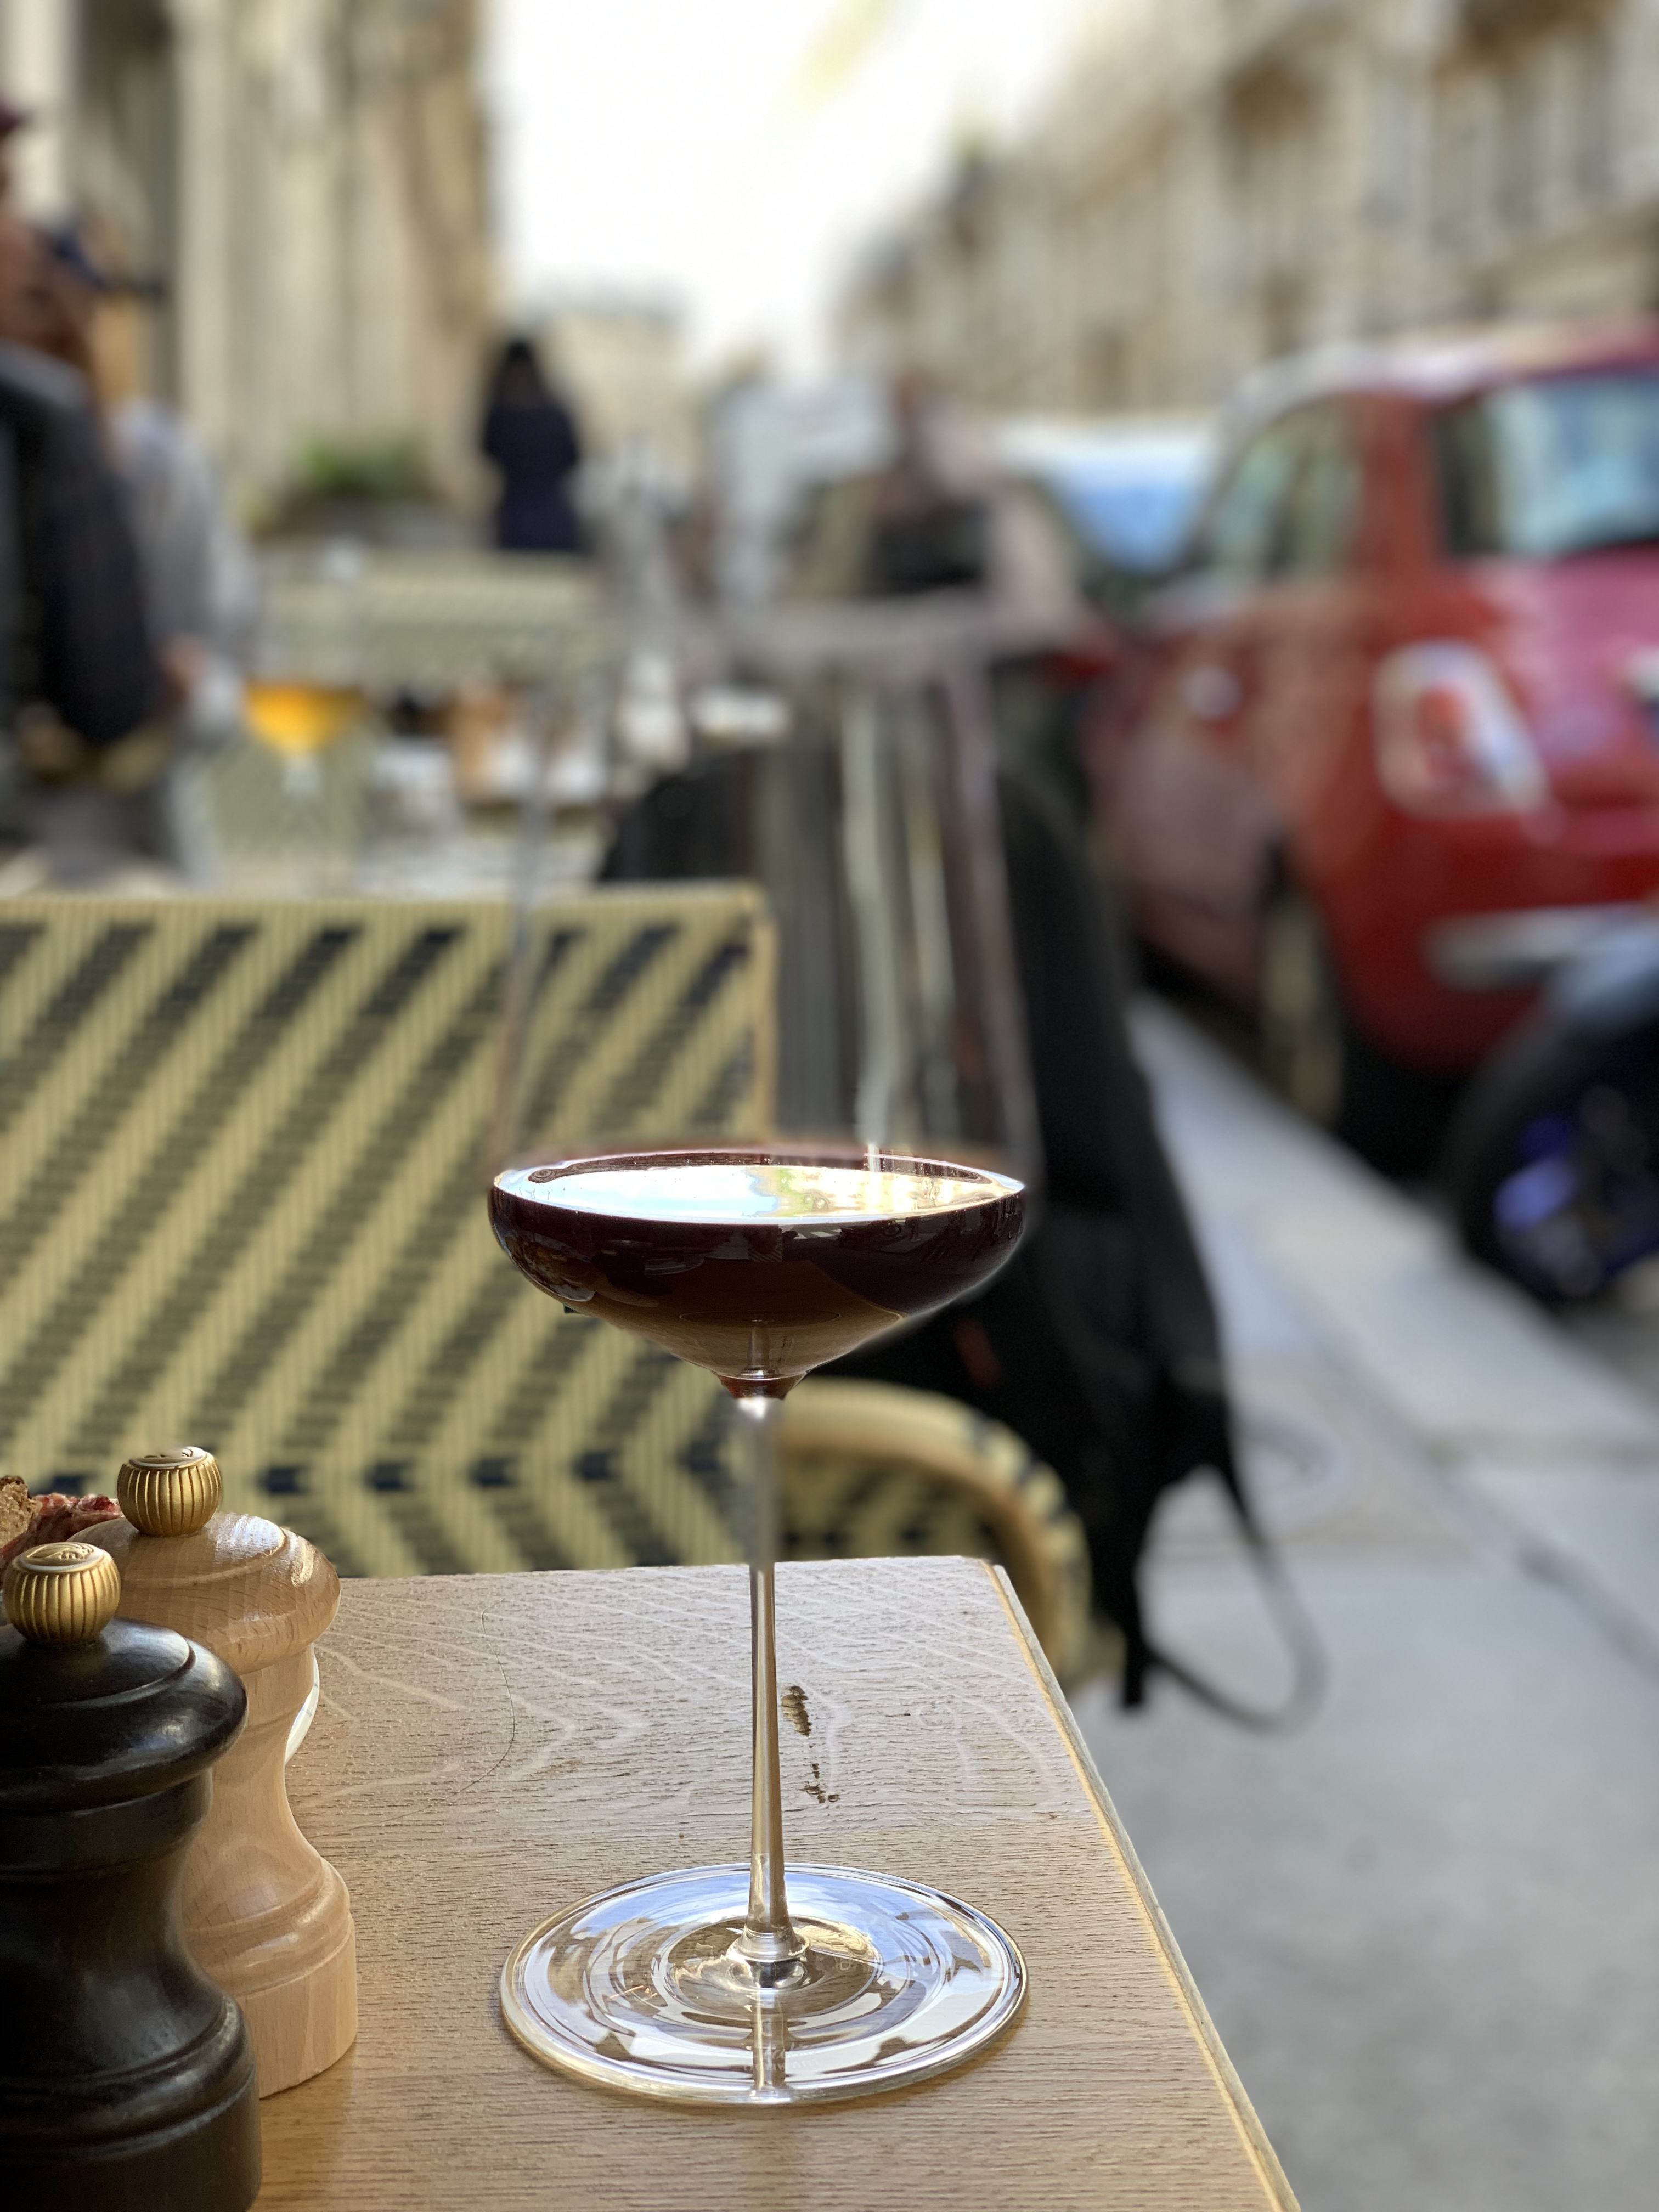 img 2414 - Paris Travel Guide